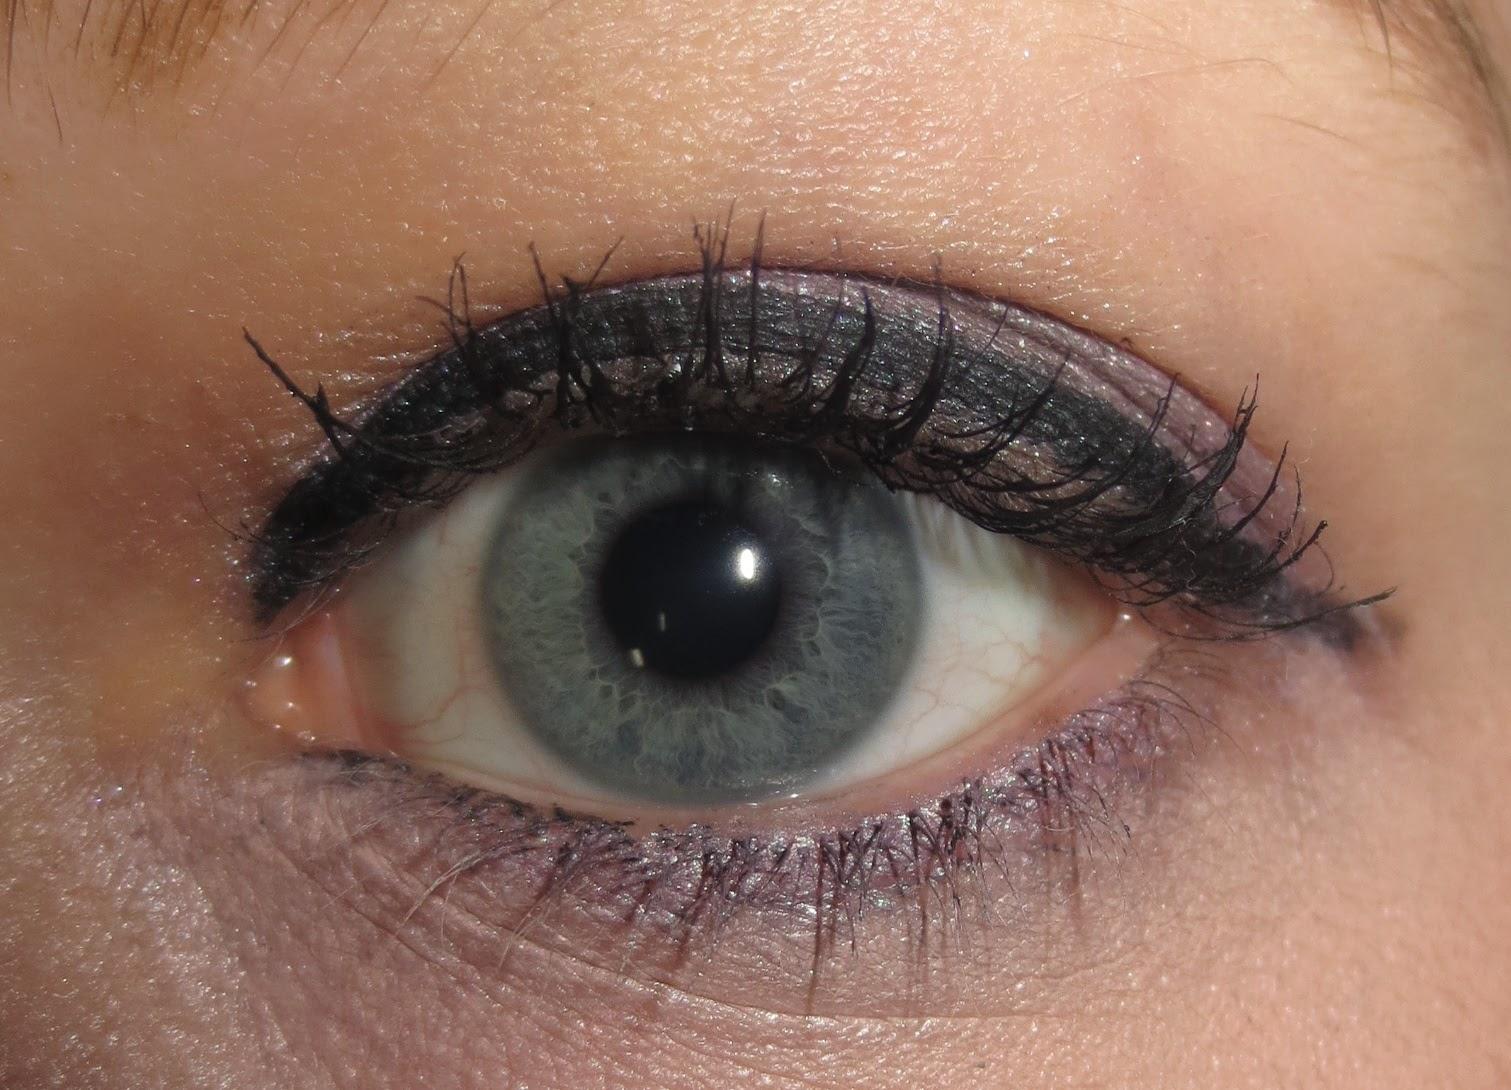 Arbonne It's a Long Story Mascara on eyes